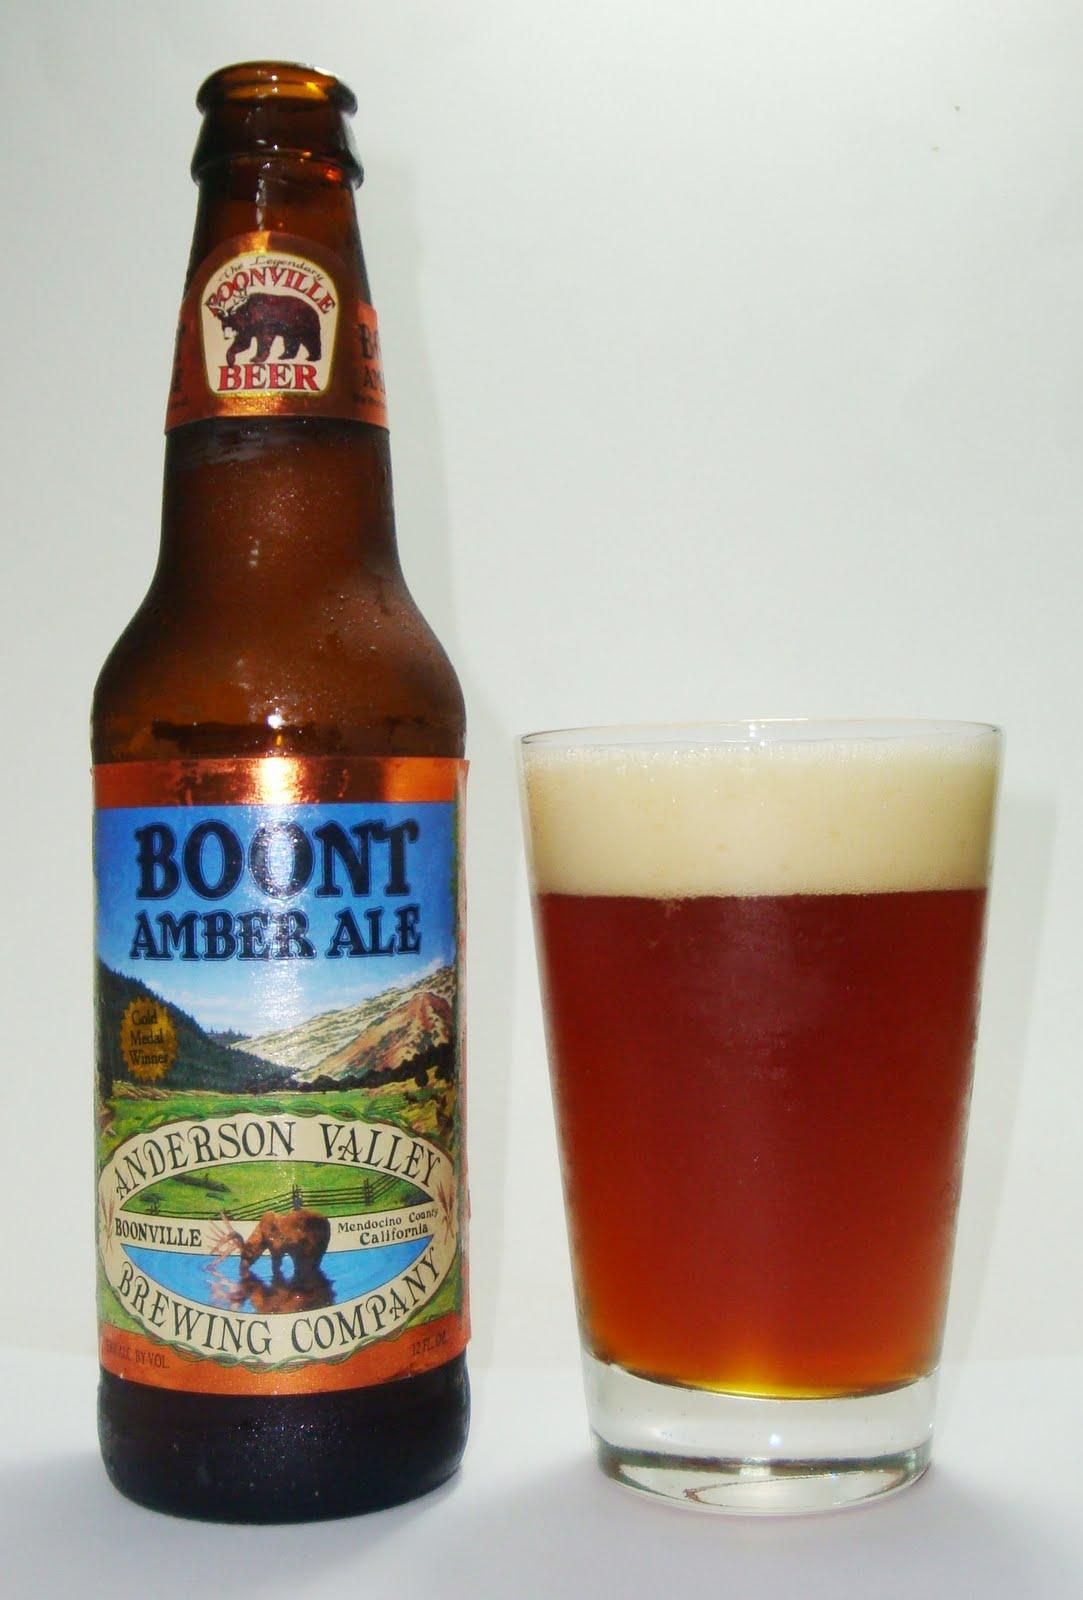 Boont Amber Ale - American Amber/Red Ale, 5.8%ABV, garrafa 355ml.